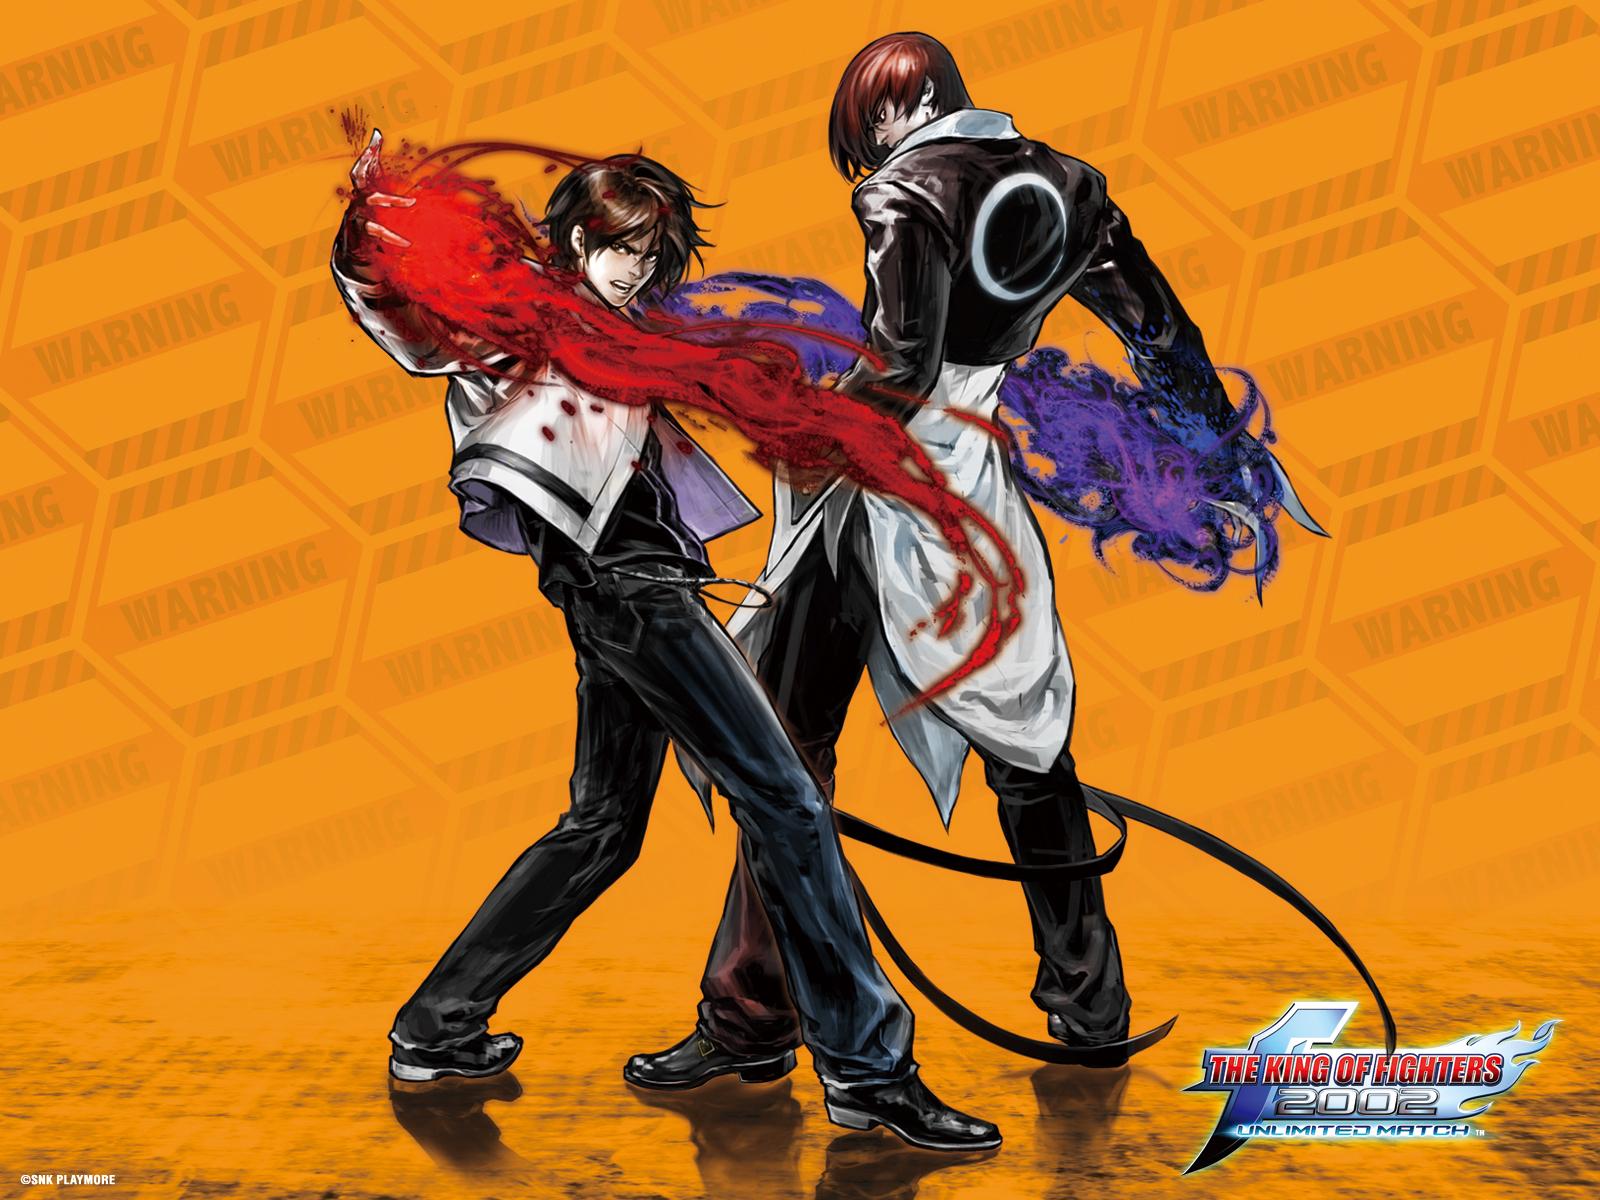 King of Fighters Wallpaper 908875   Zerochan Anime Image 1600x1200